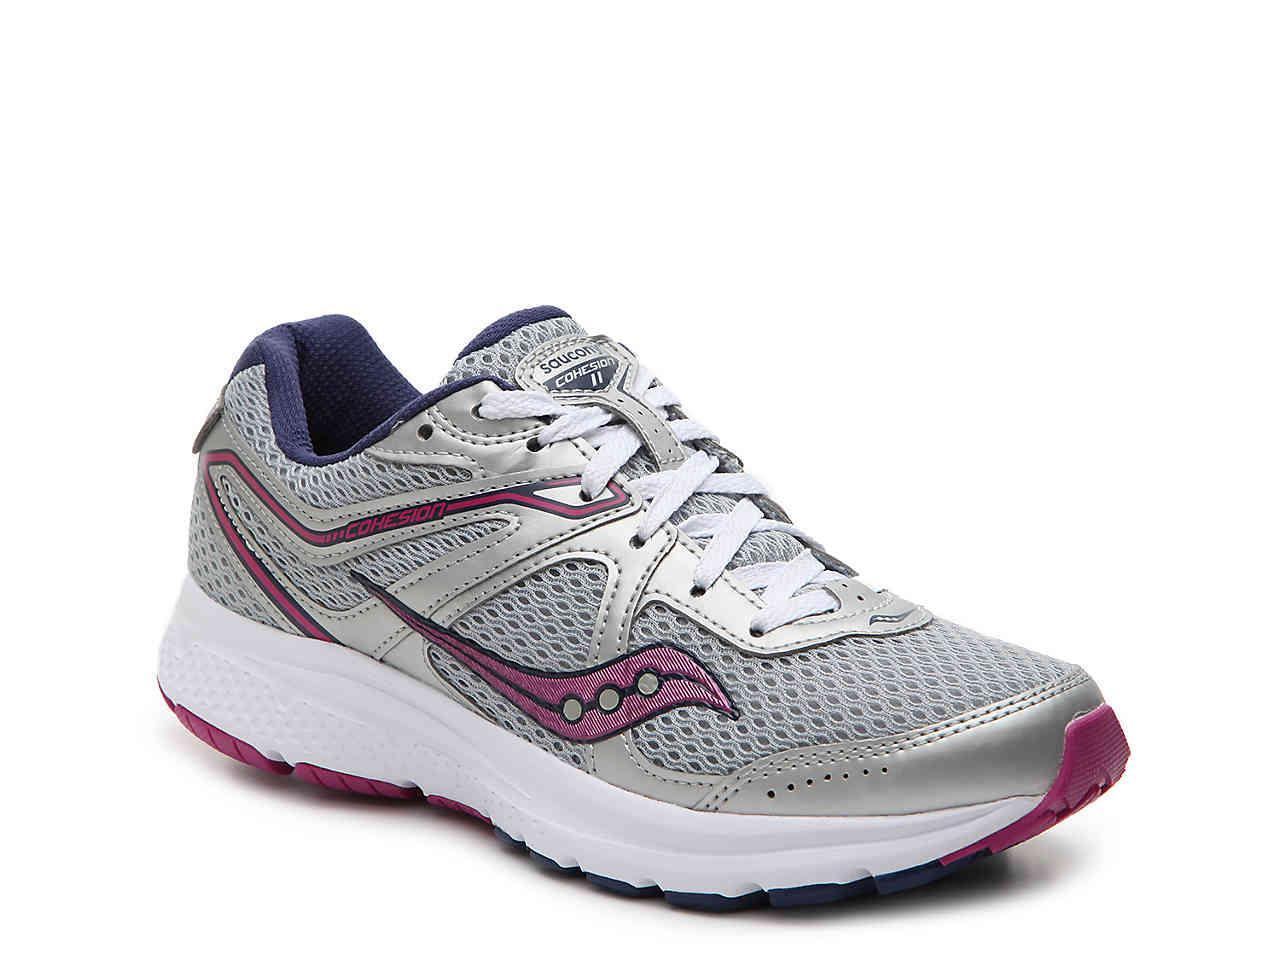 Saucony Men/'s Grid Cohesion 11 Running Shoe CHARCOAL//BLU S20420-6 Pick A SZ NWB